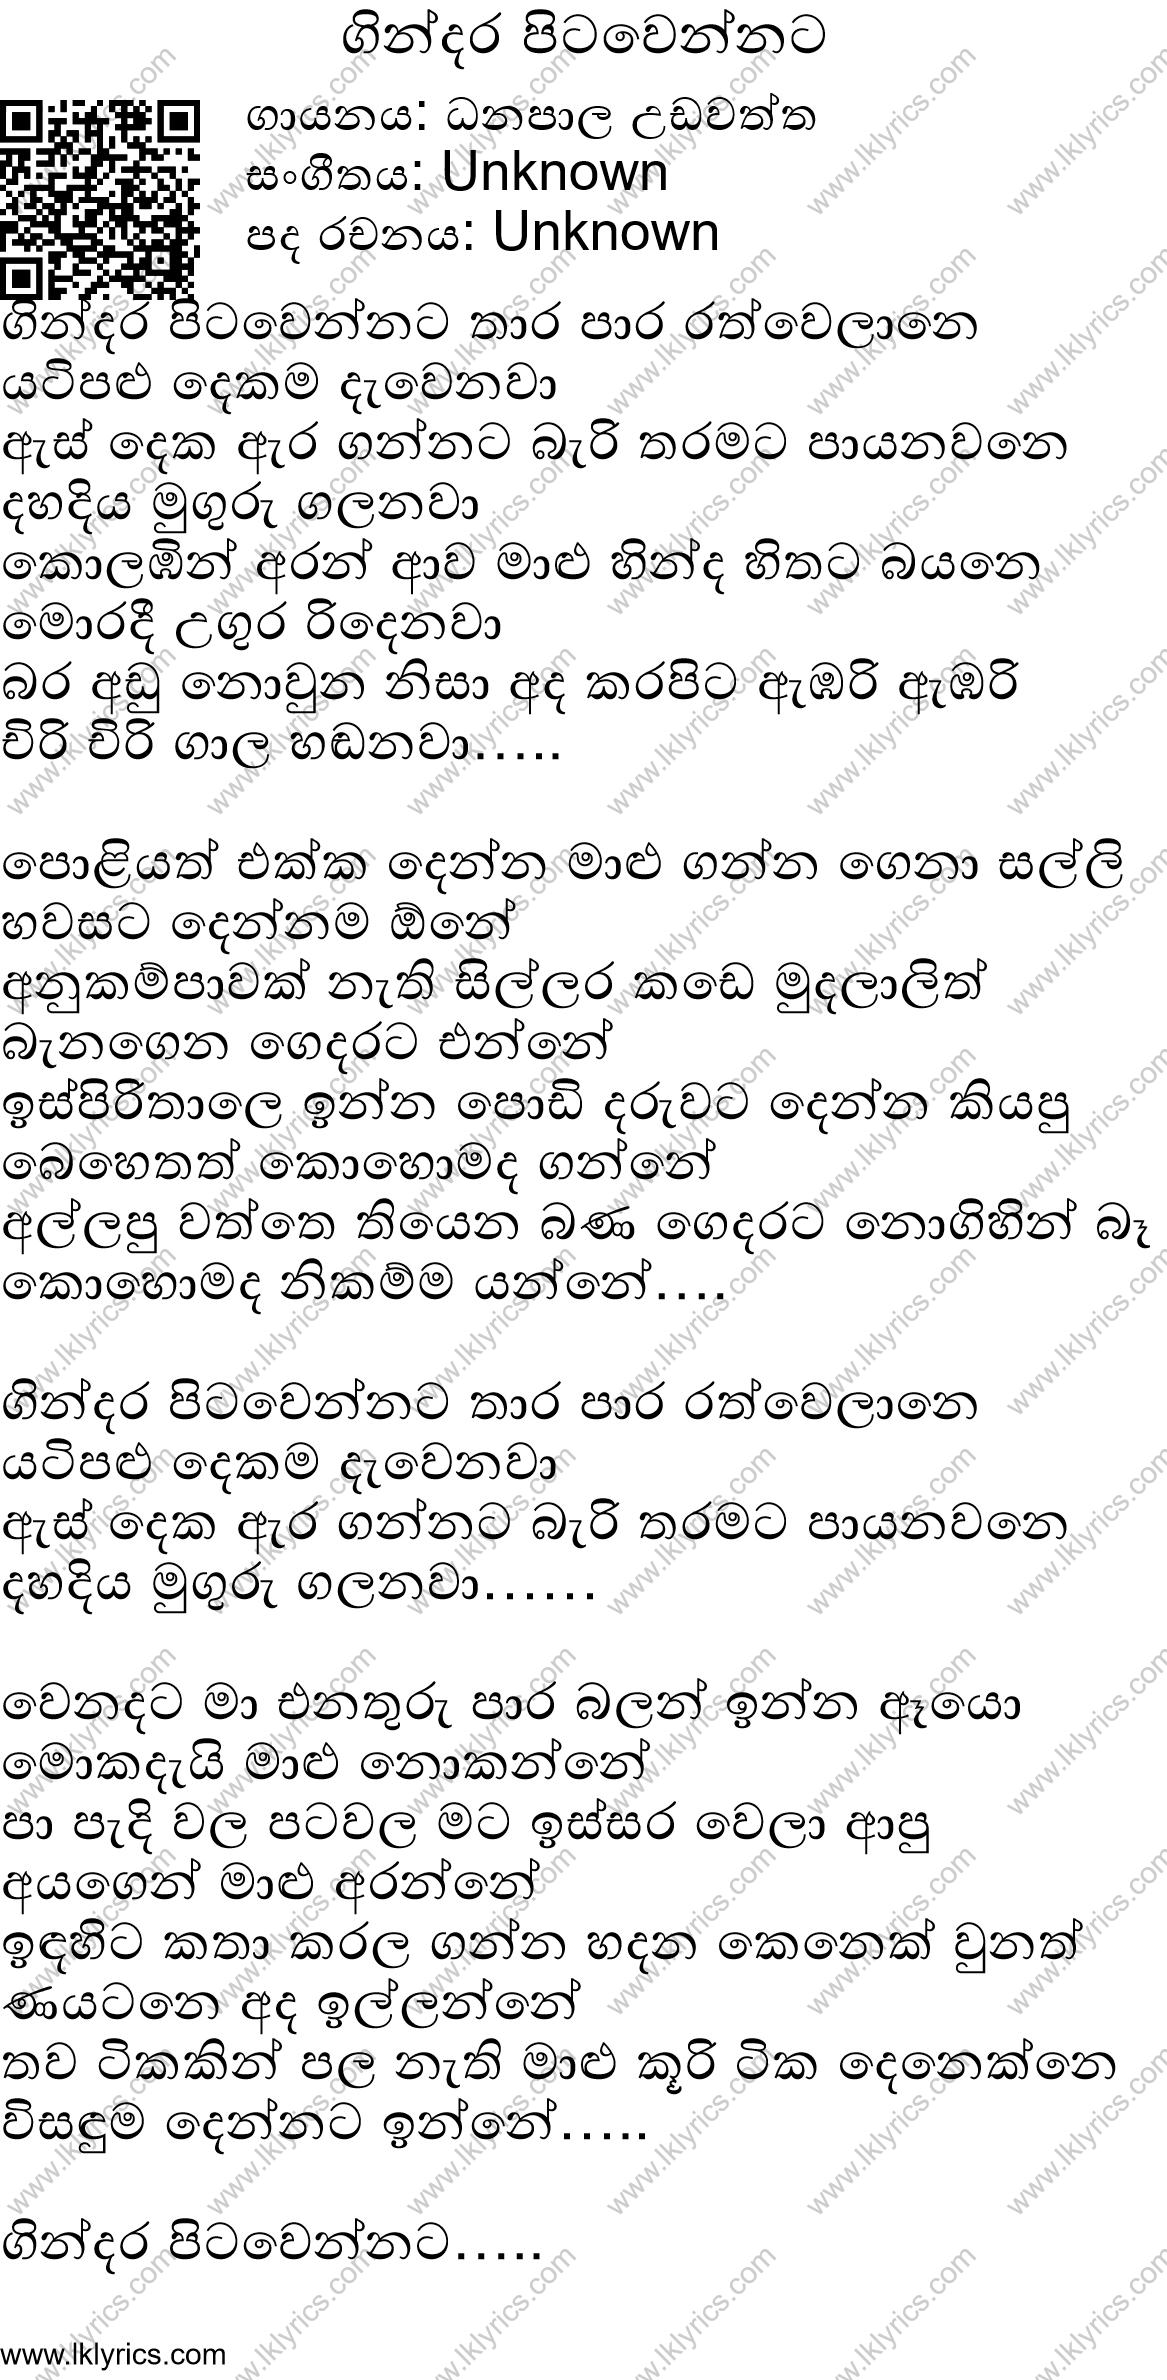 Gindara Pitawennata Lyrics - LK Lyrics